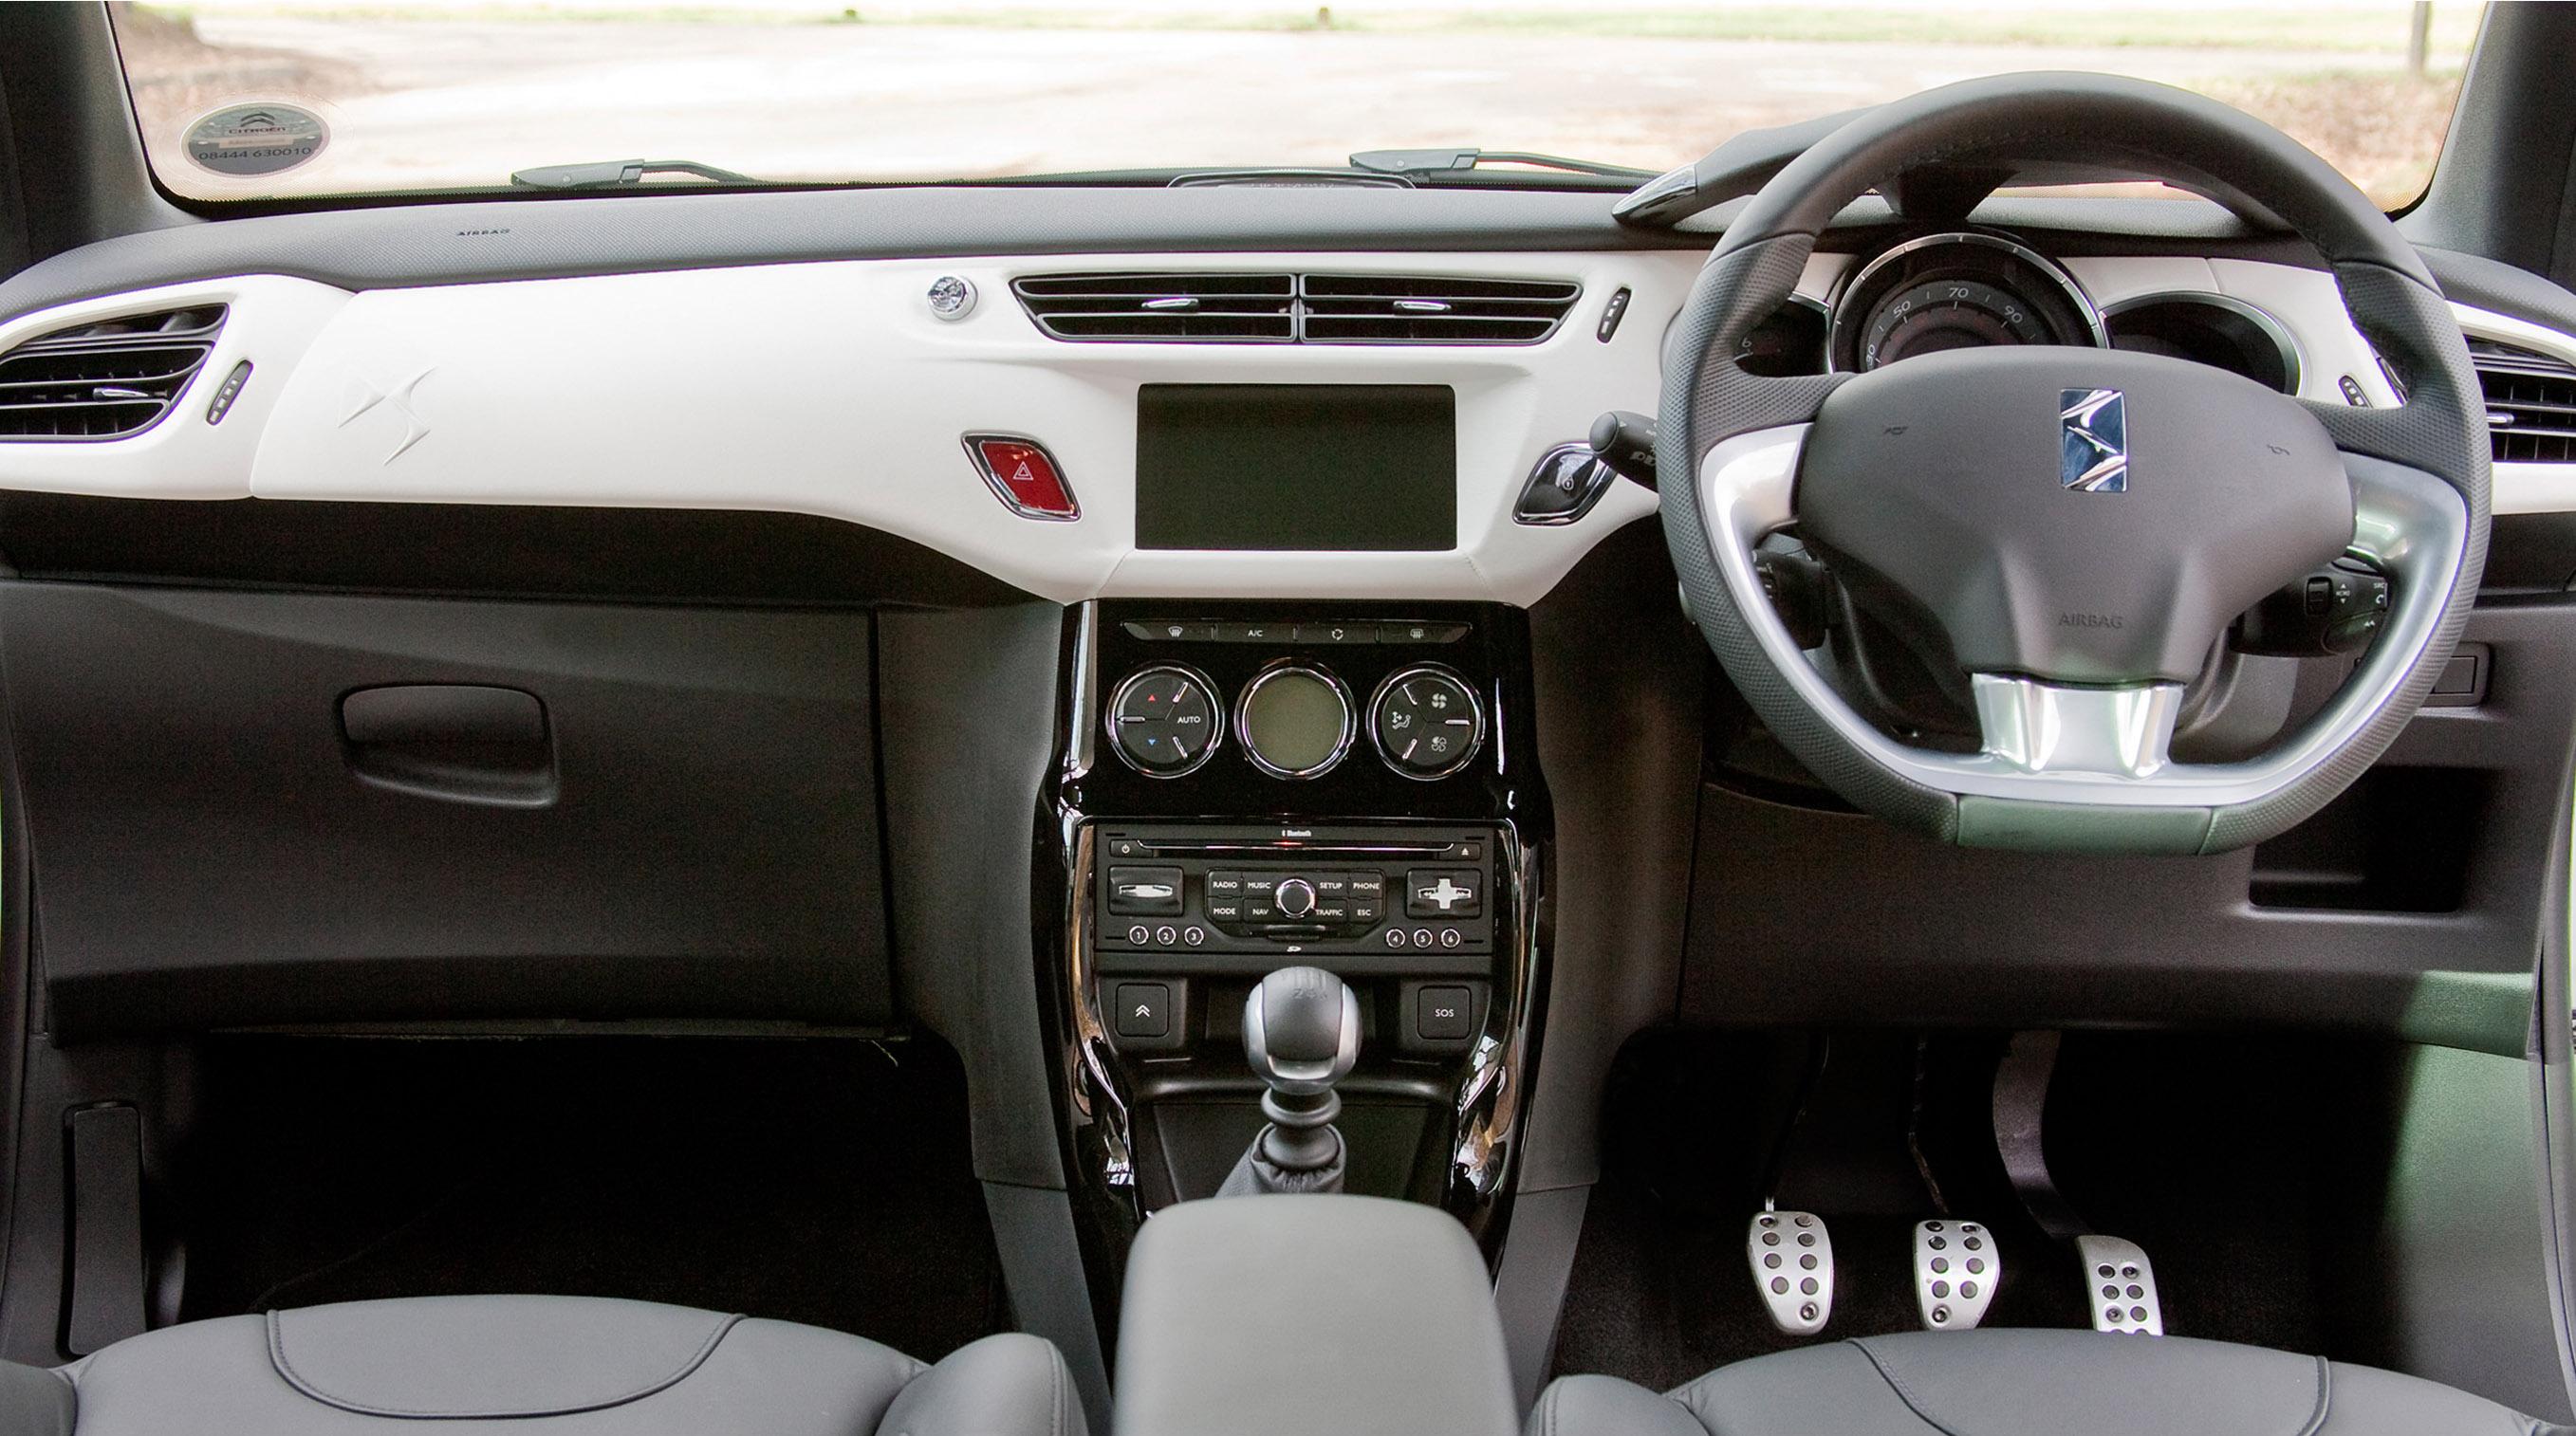 2012 Citroen Ds3 Ultra Prestige Price 163 20 700